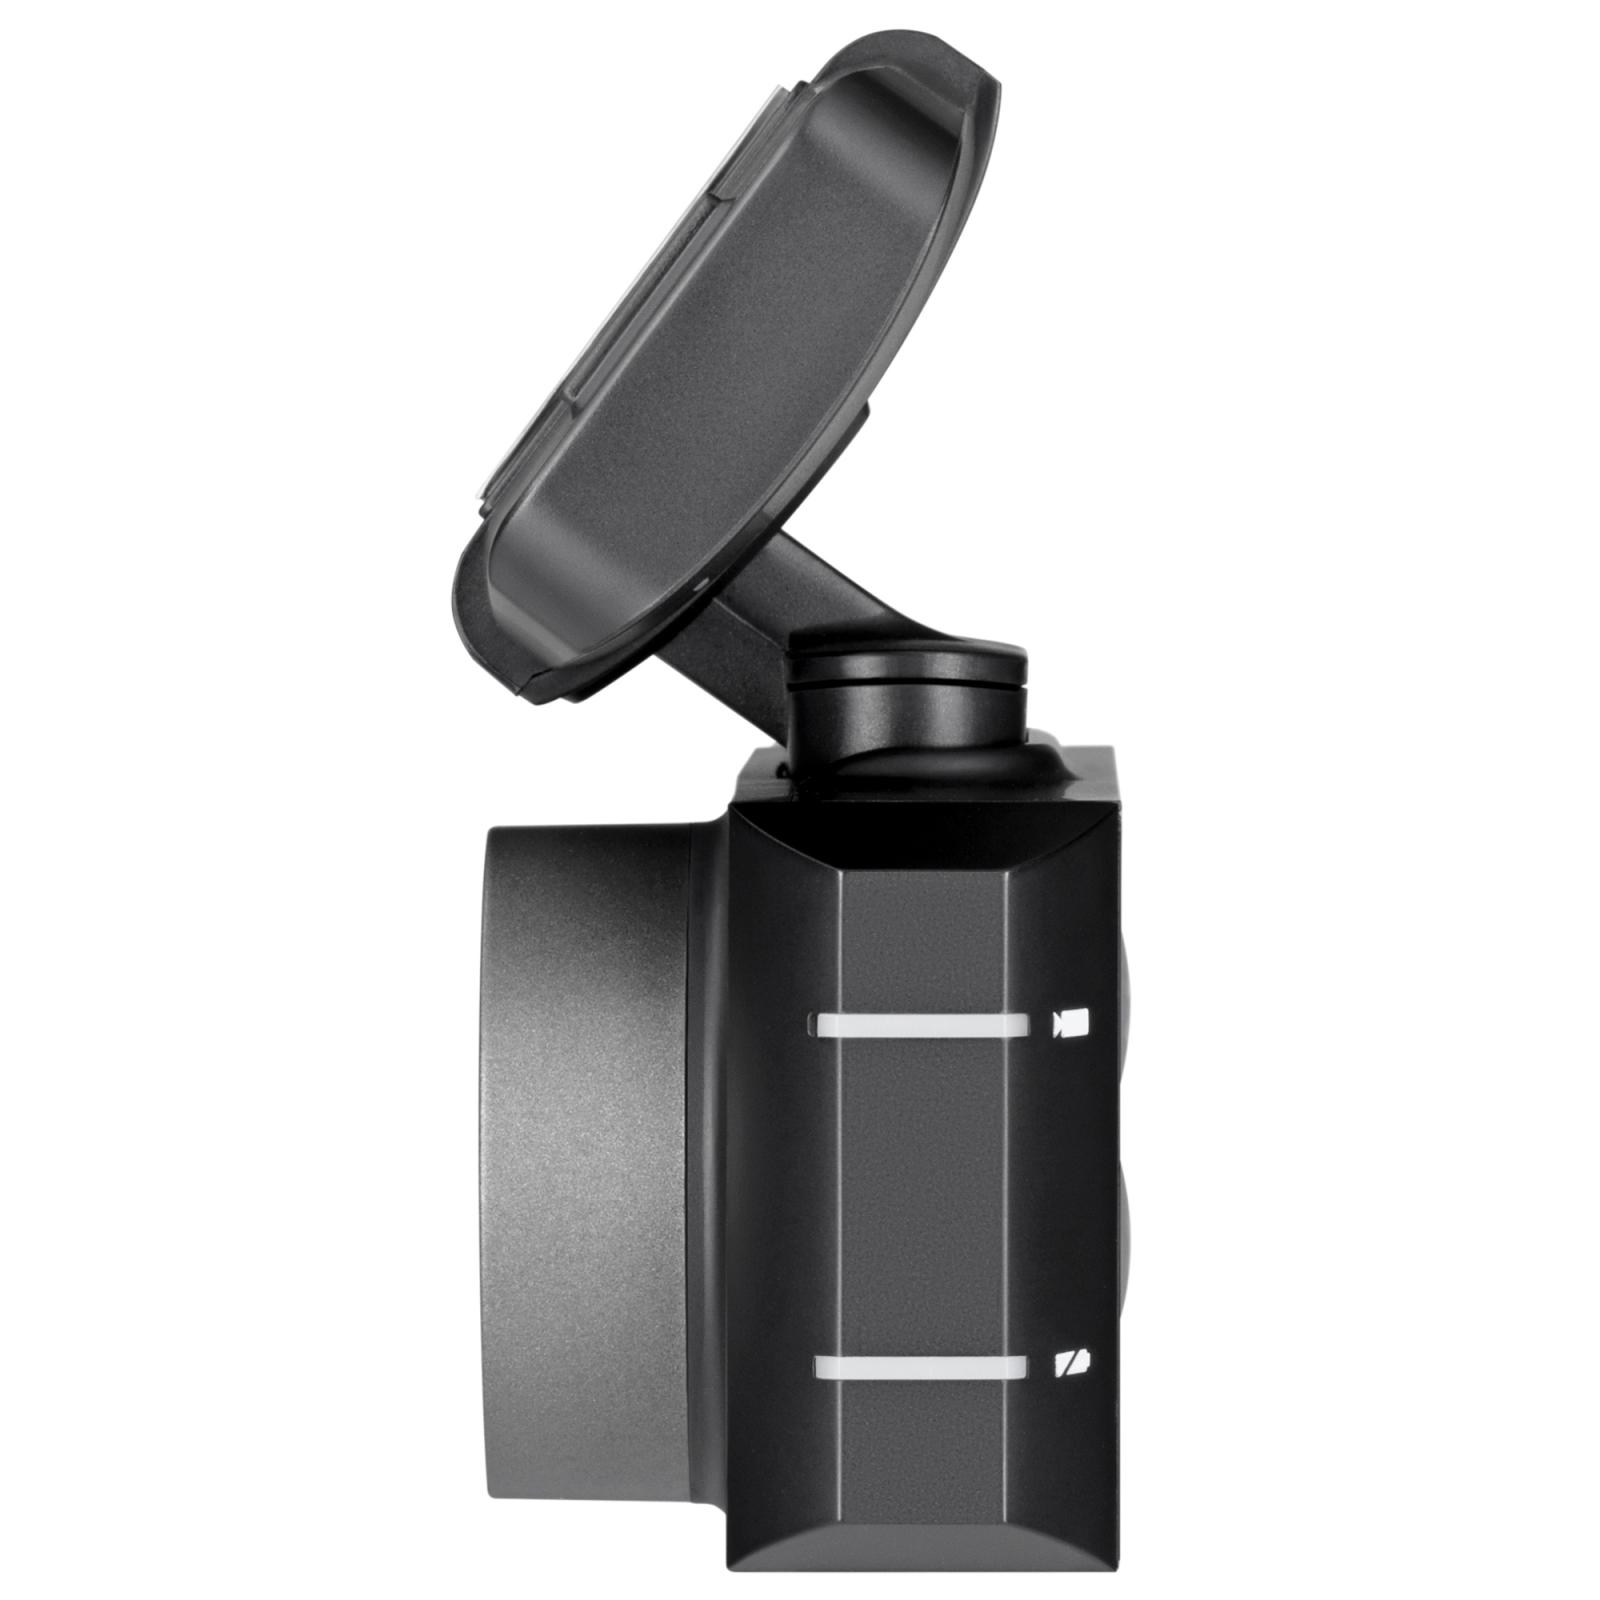 Відеореєстратор 2E Drive 700 Magnet (2E-DRIVE700MAGNET) зображення 4